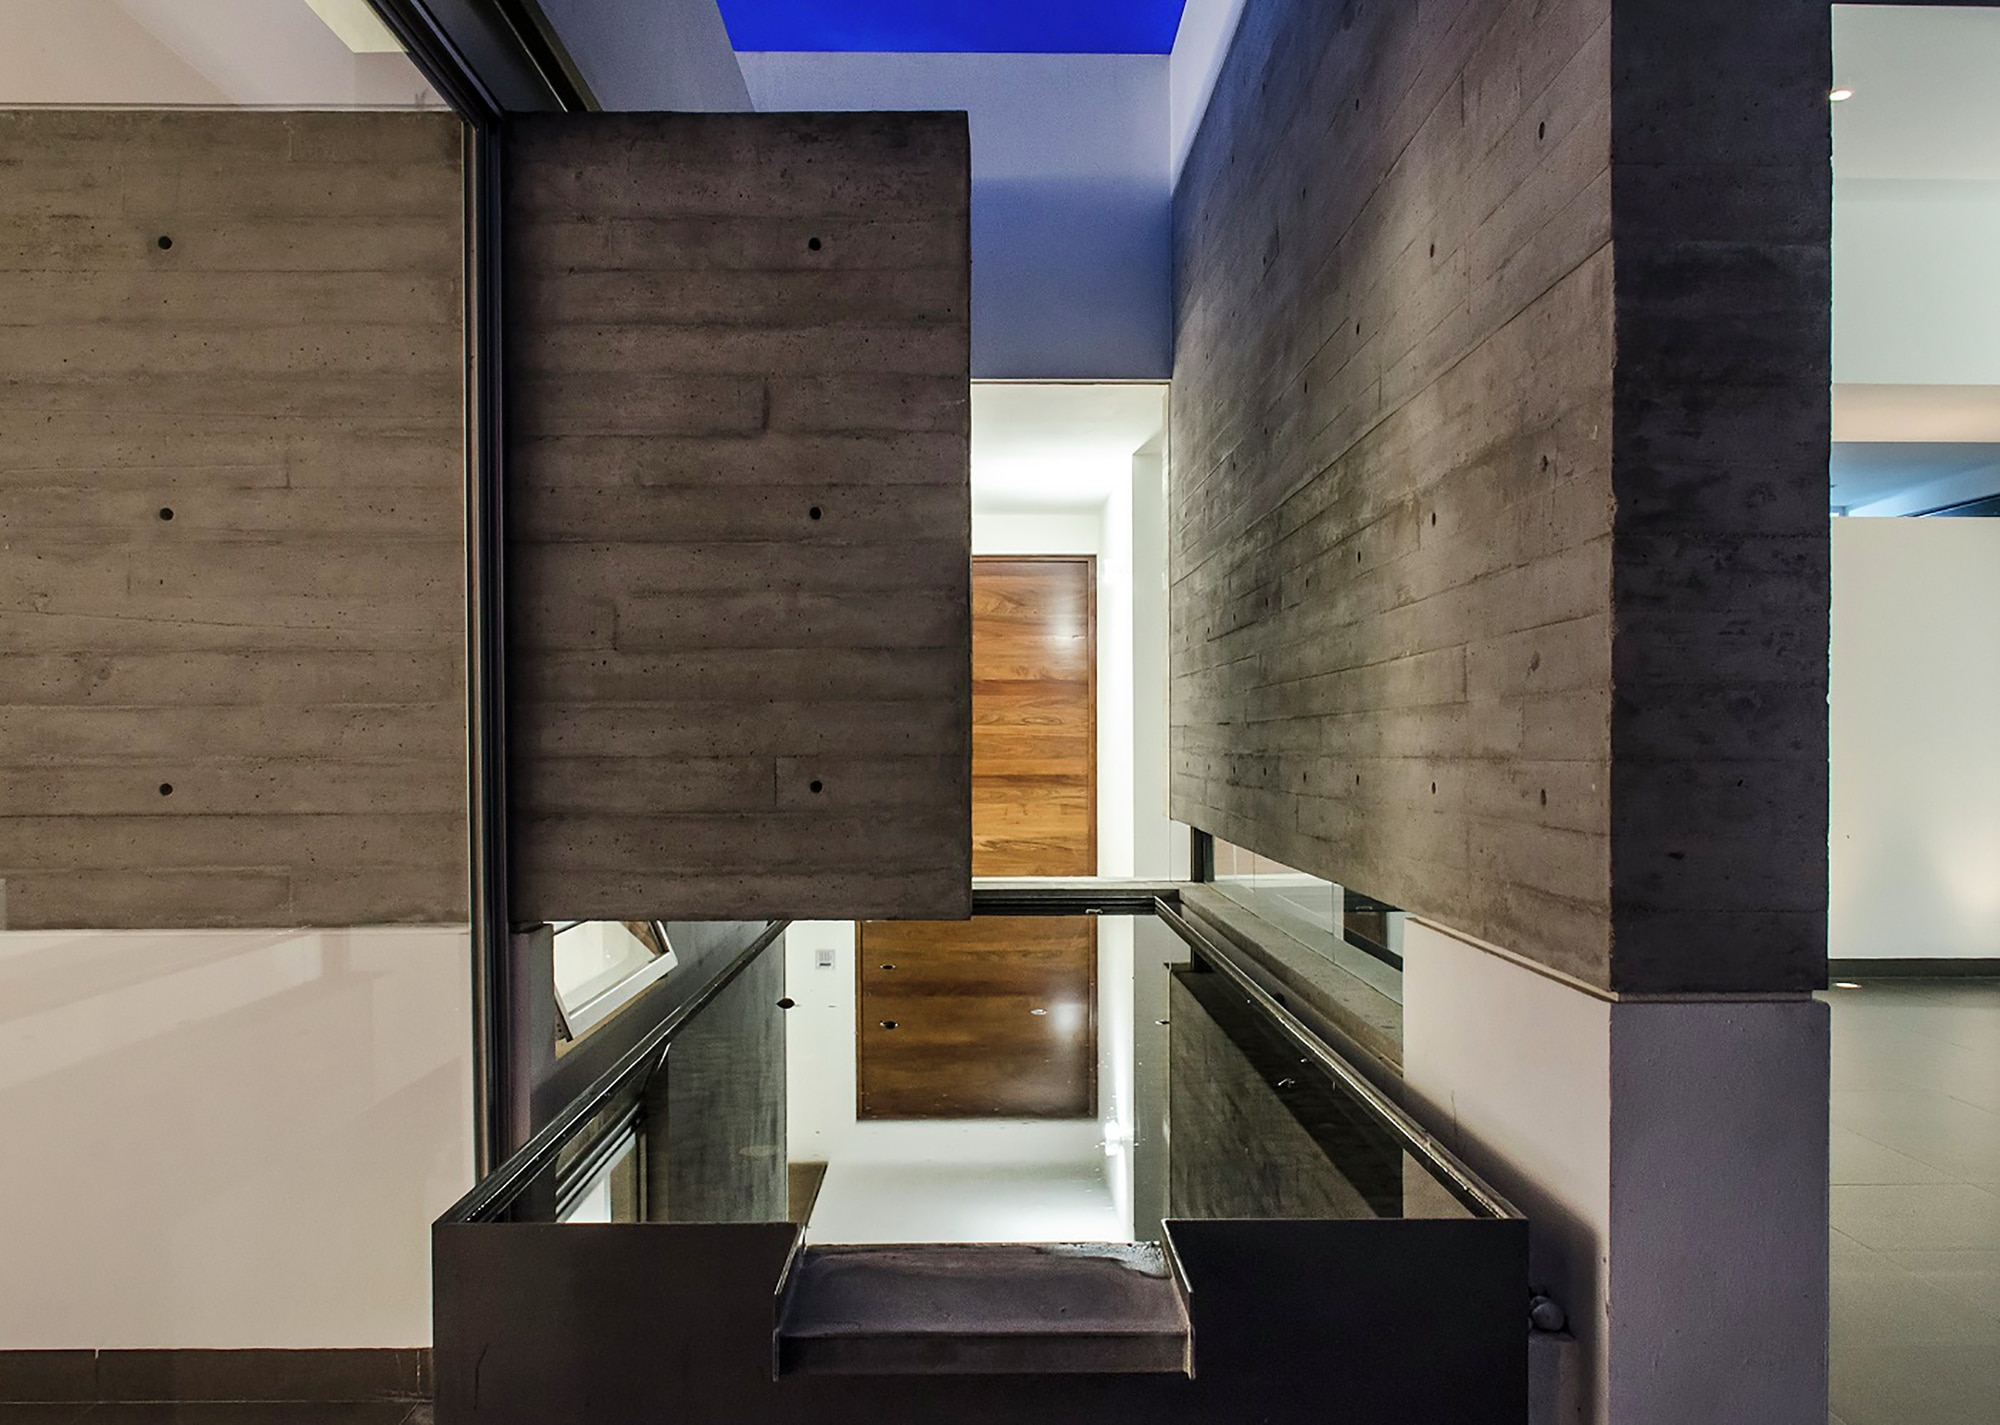 Dise o casa moderna de un piso construye hogar for Paginas de arquitectura y diseno de interiores